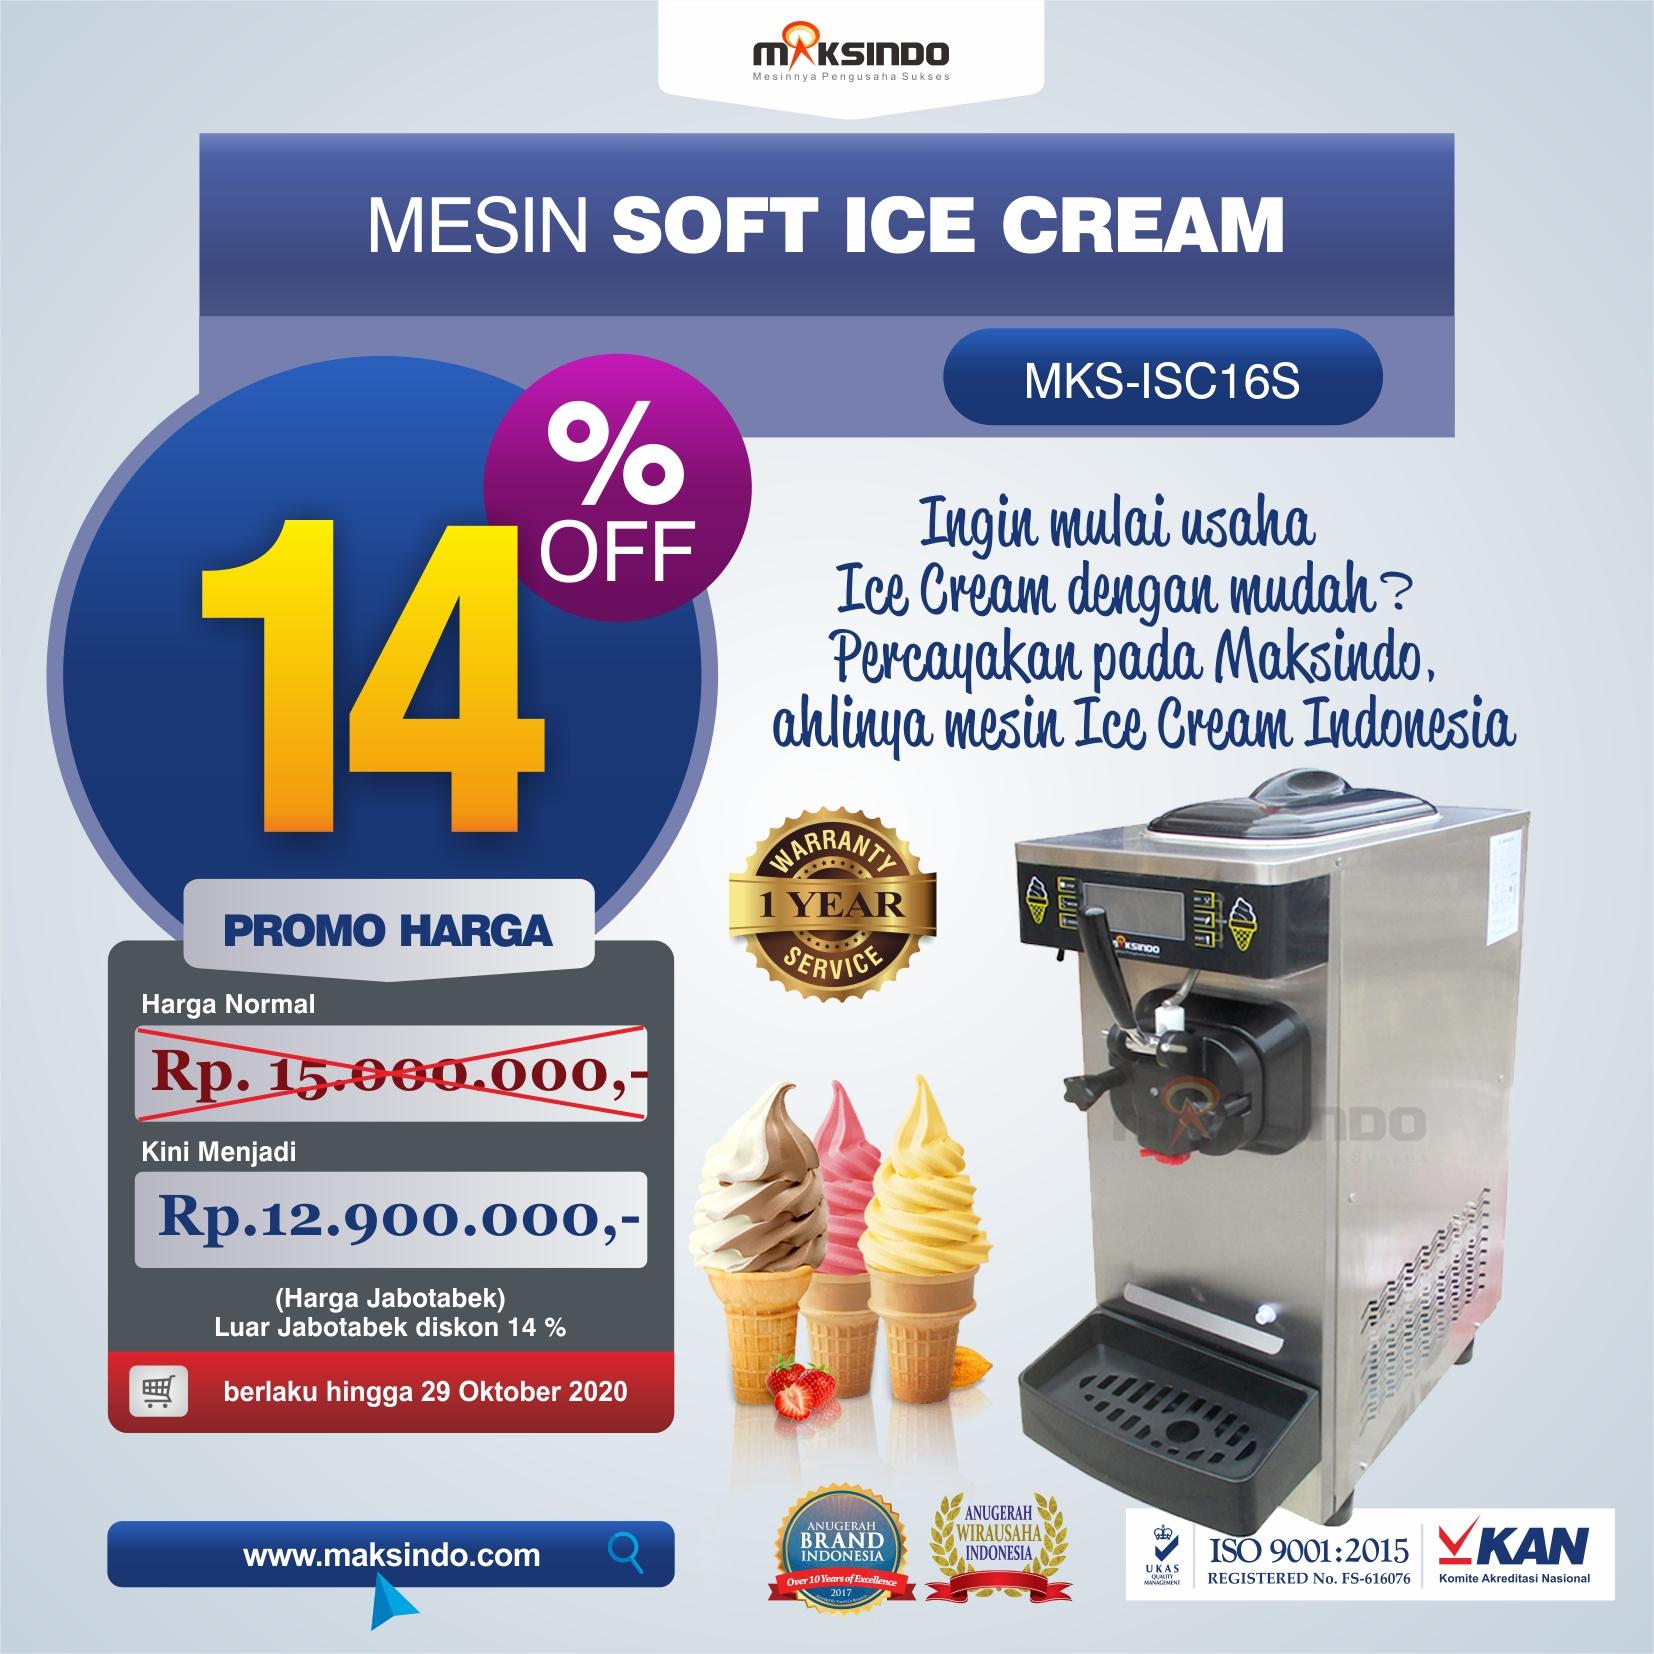 Jual Mesin Soft Ice Cream ISC-16S di Jakarta